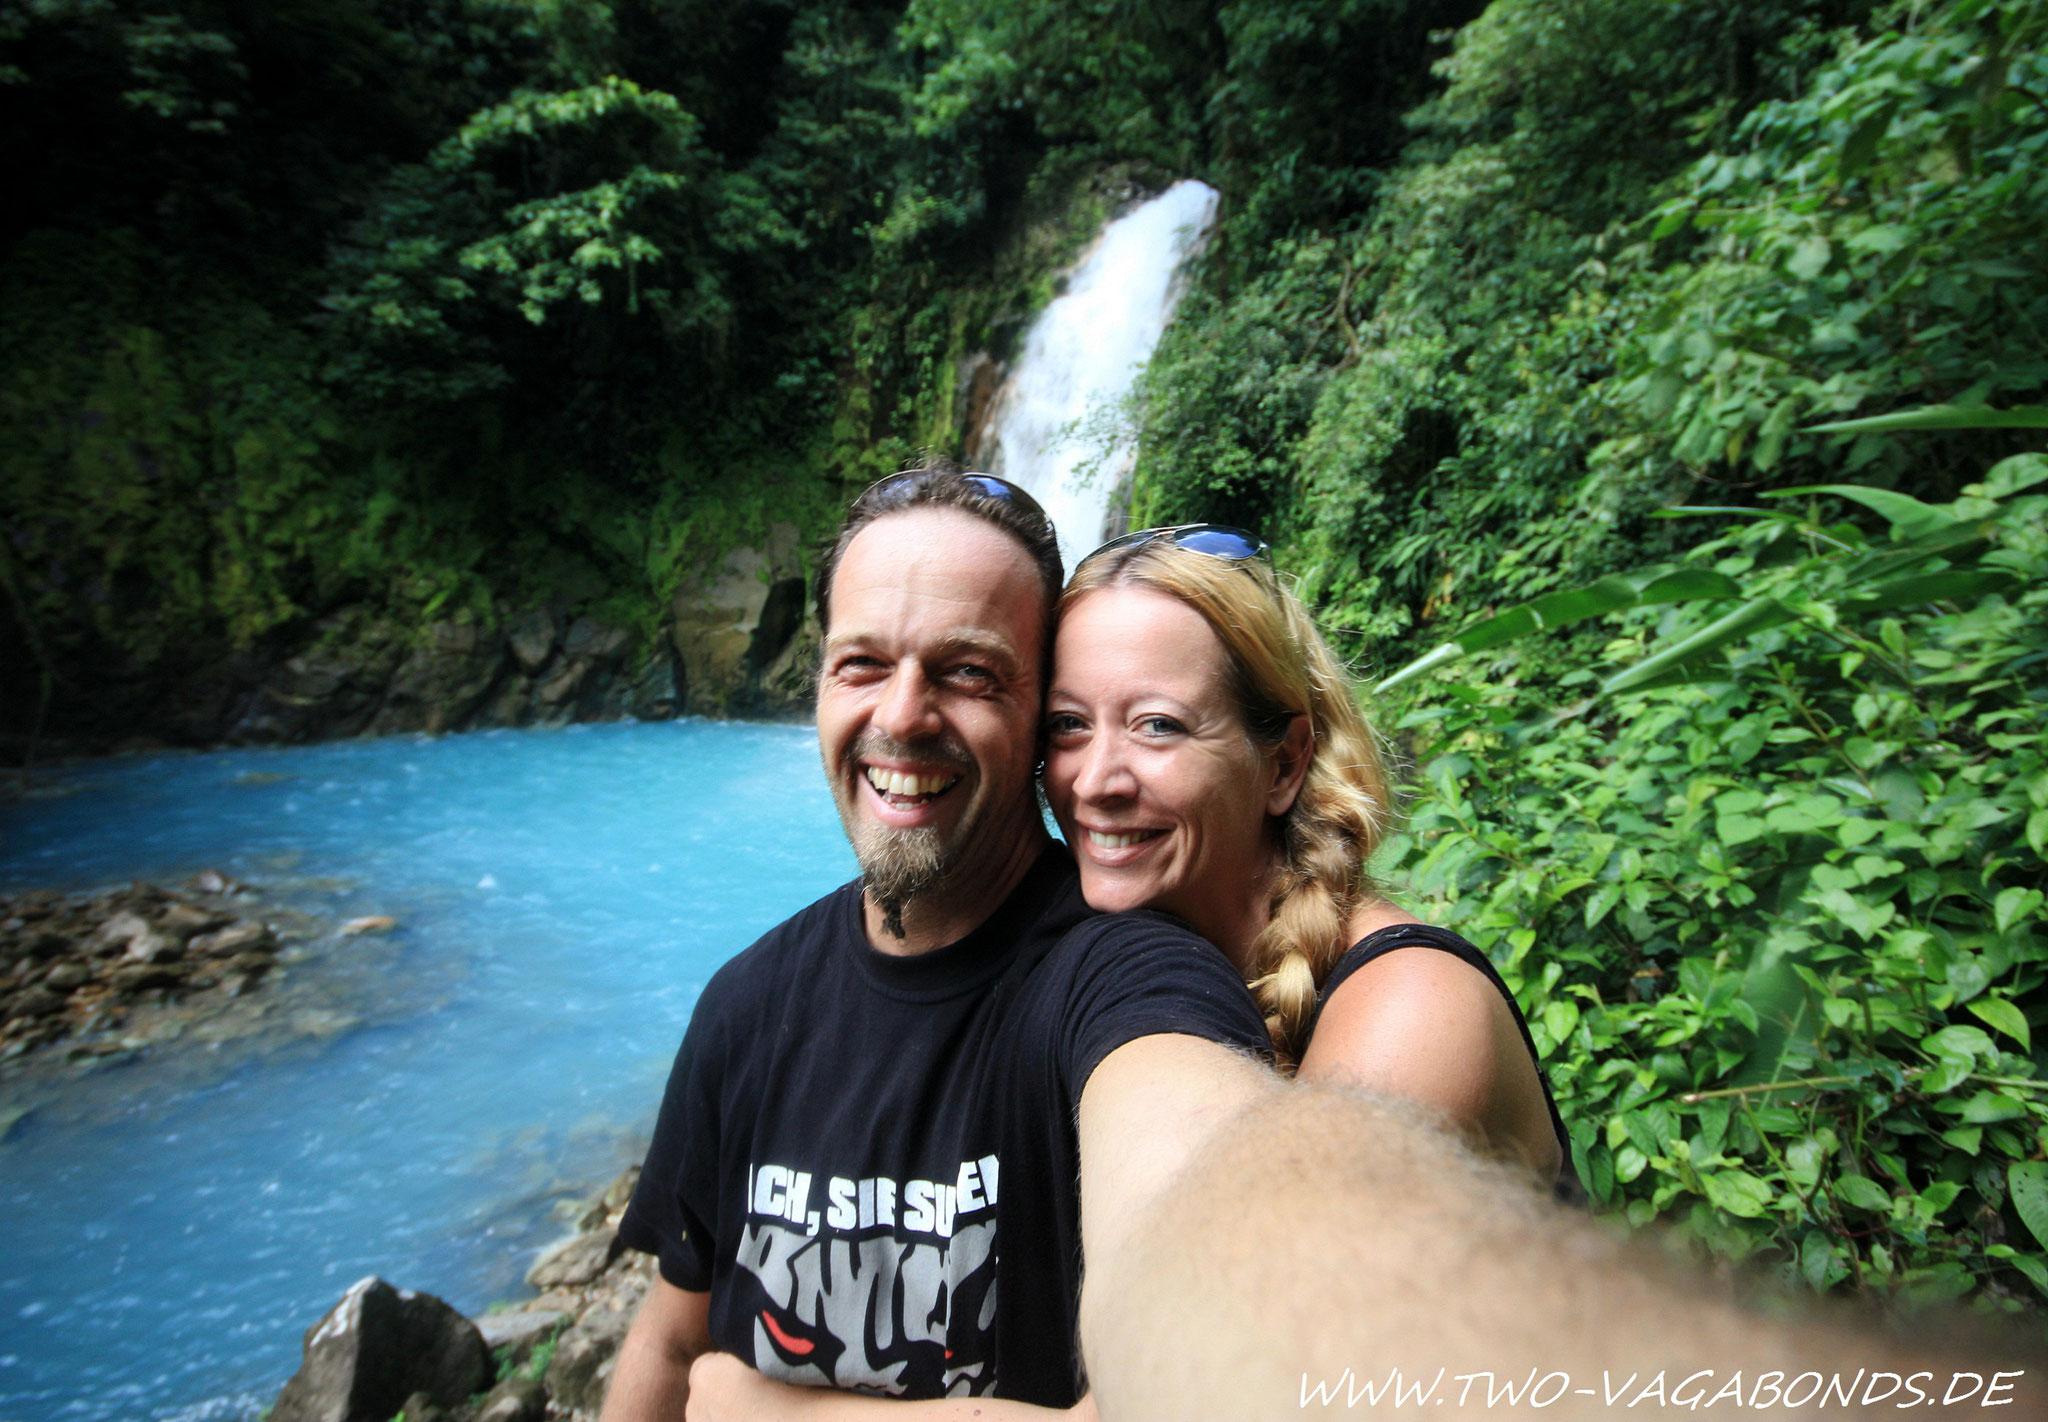 COSTA RICA 2013 - RIO CELESTE